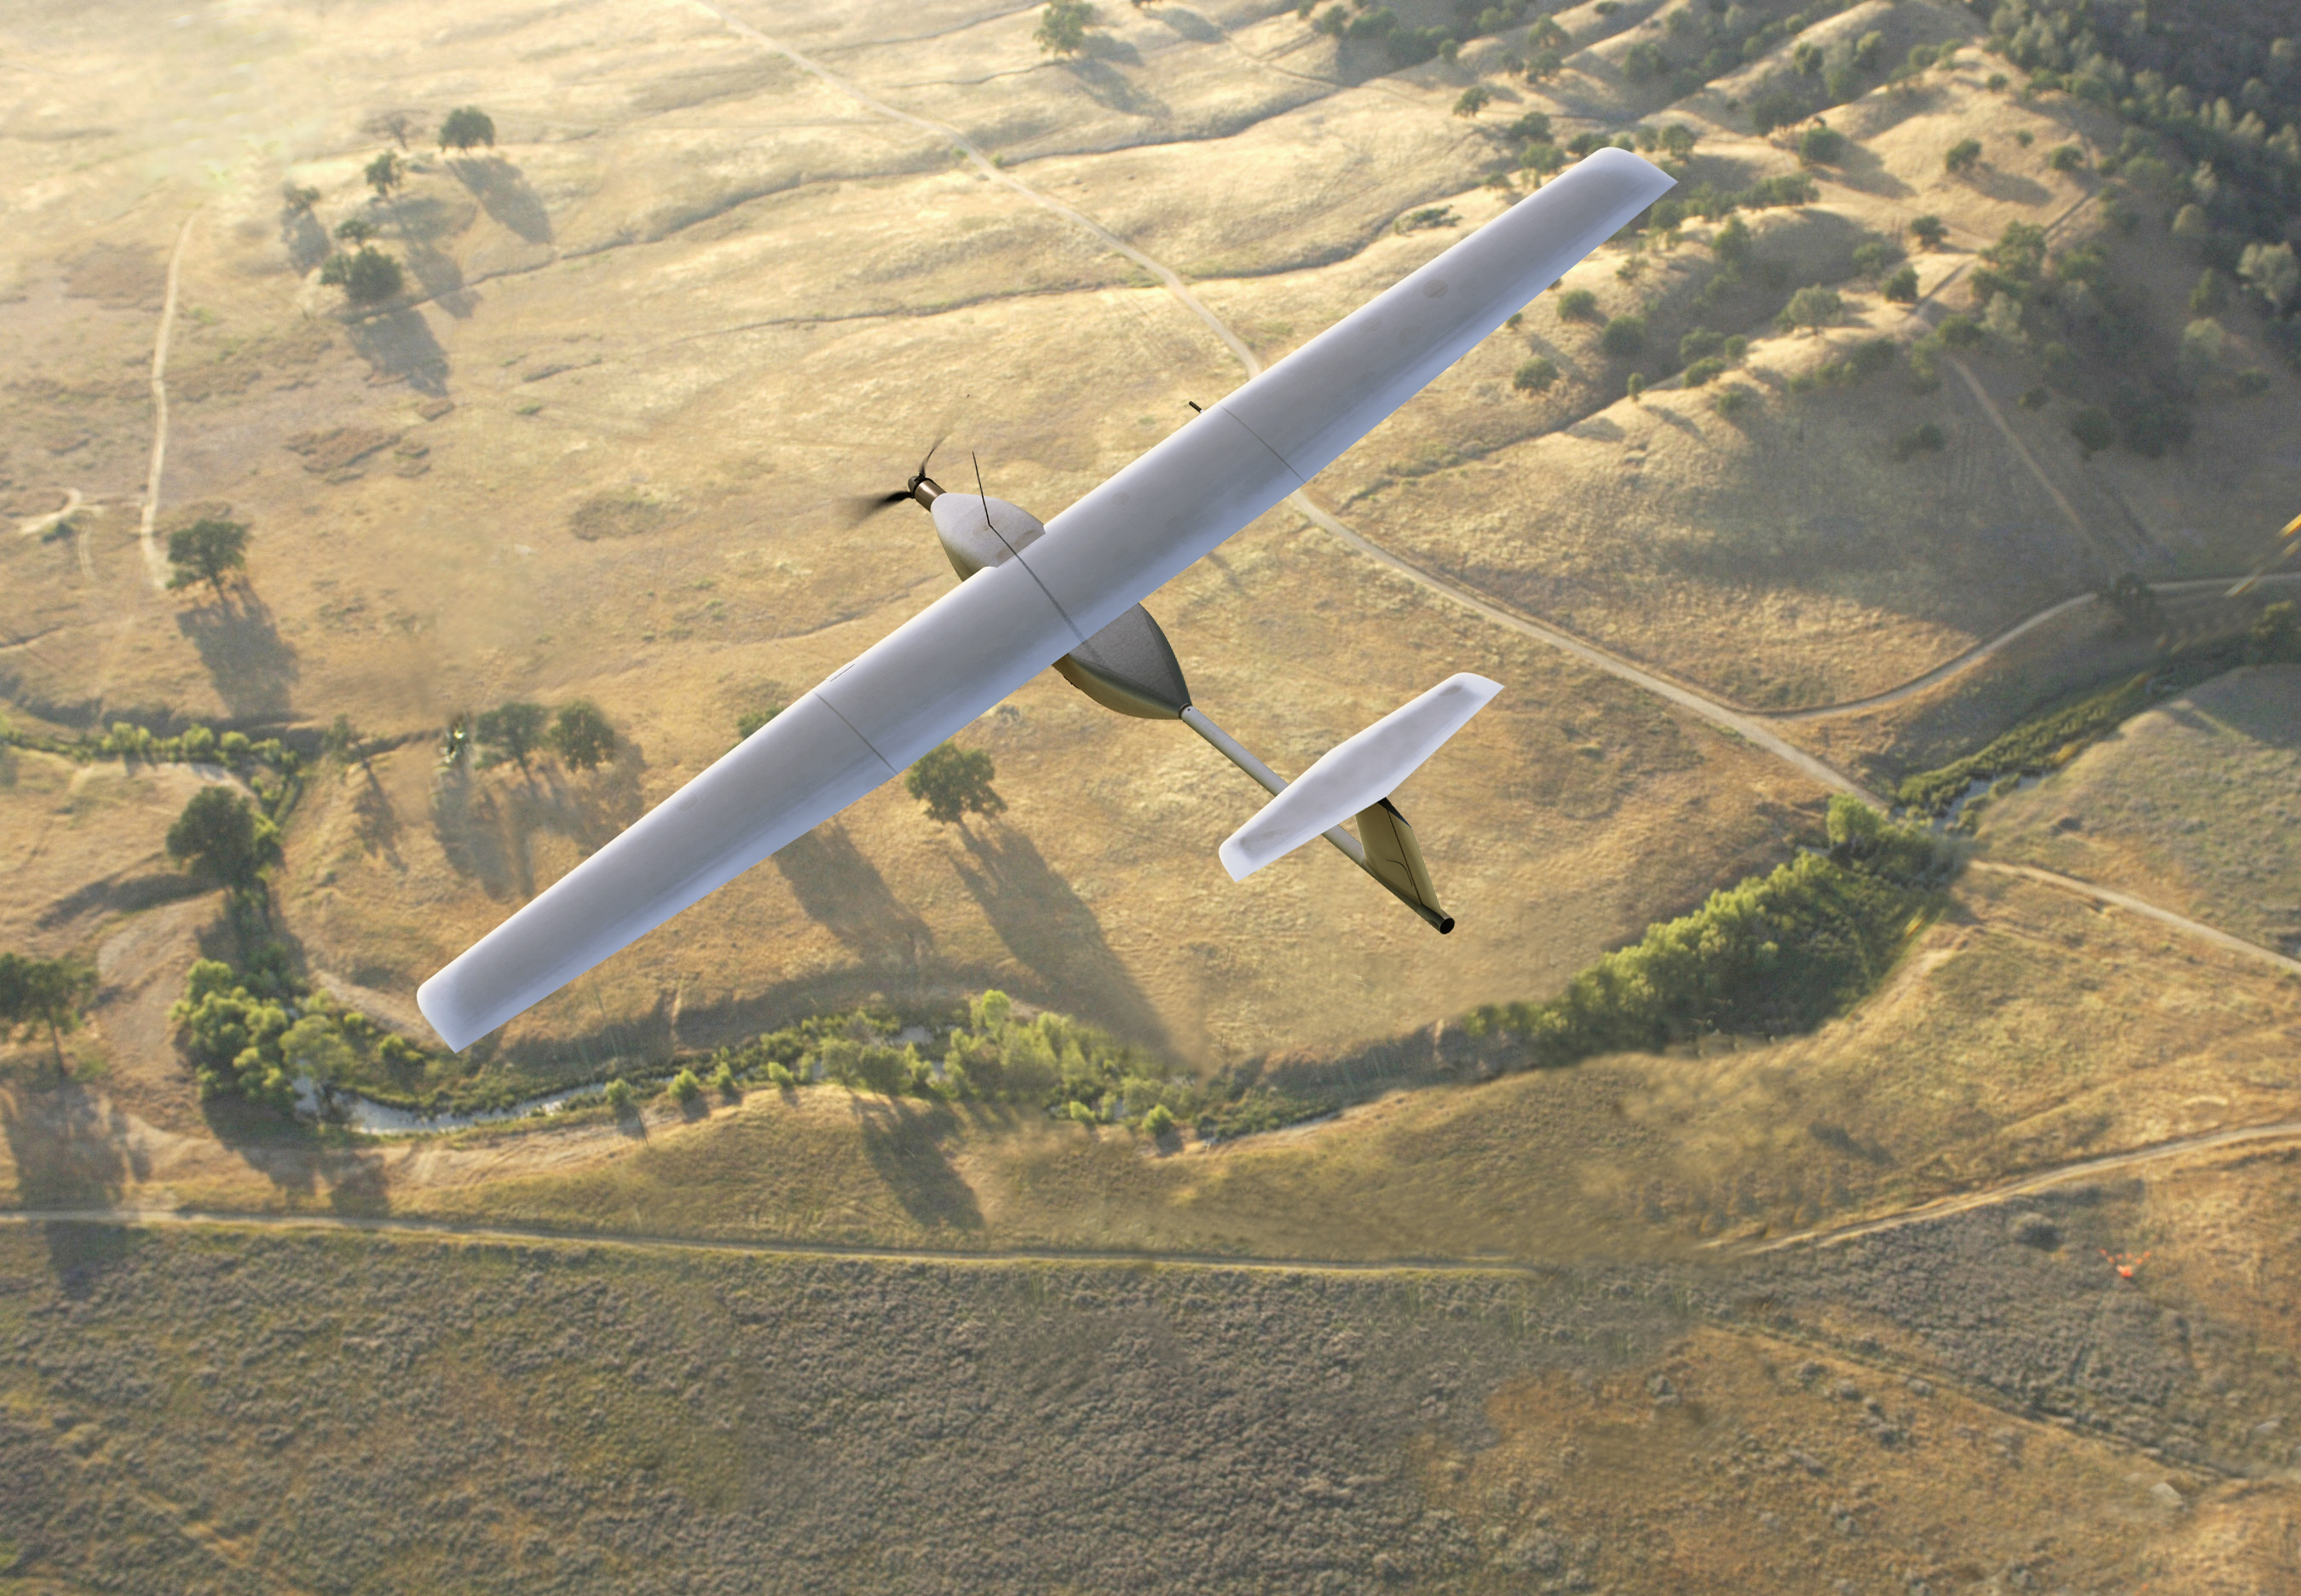 Stalker Aircraft Makes First Laser Powered Outdoor Flights Geekwire